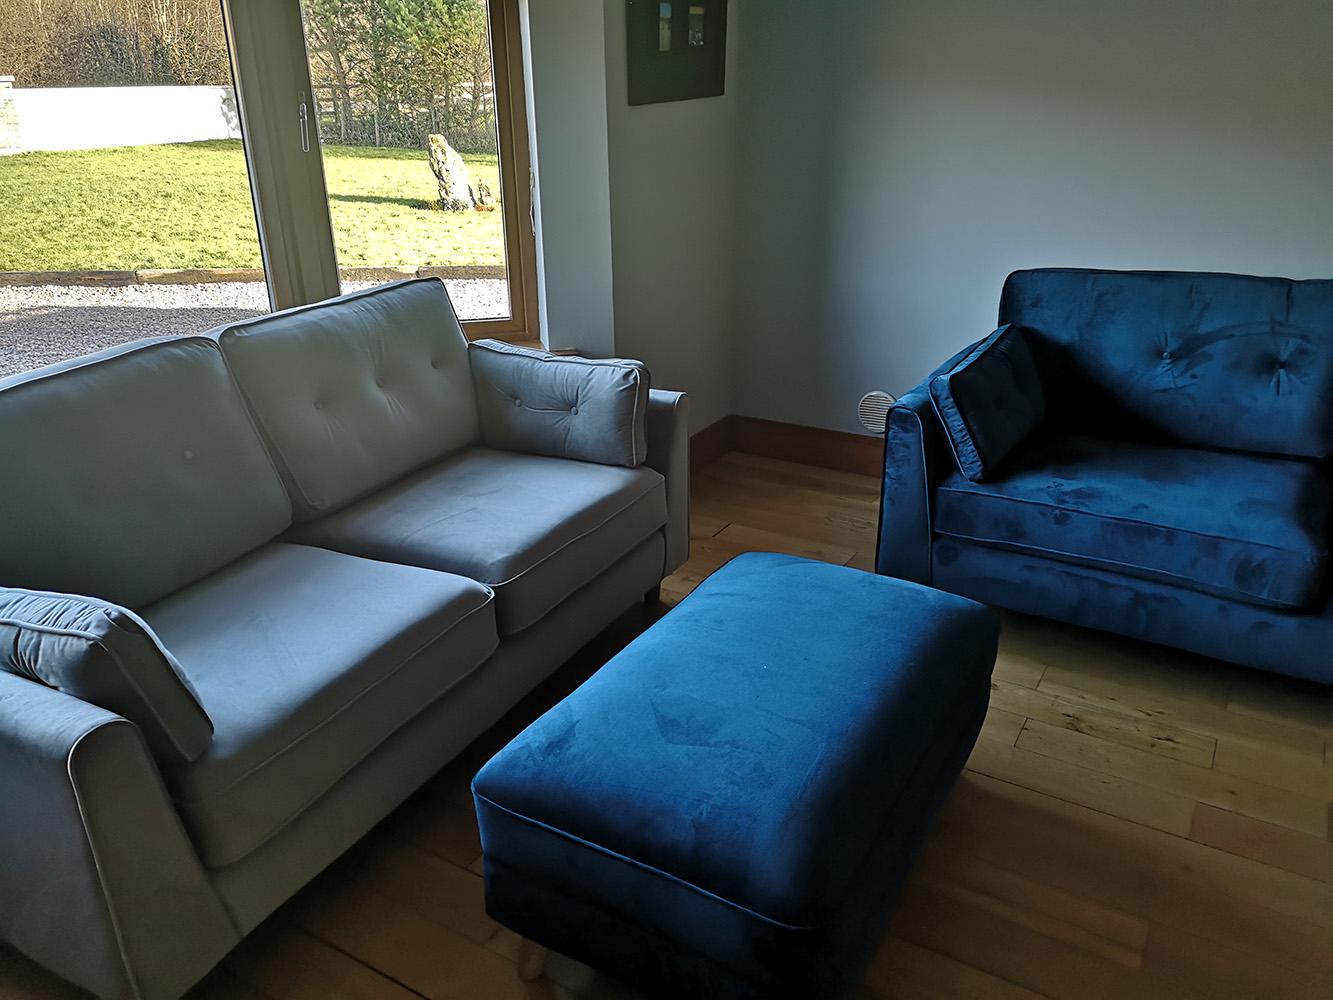 Hellblaues und marineblaues Sofa Magnus